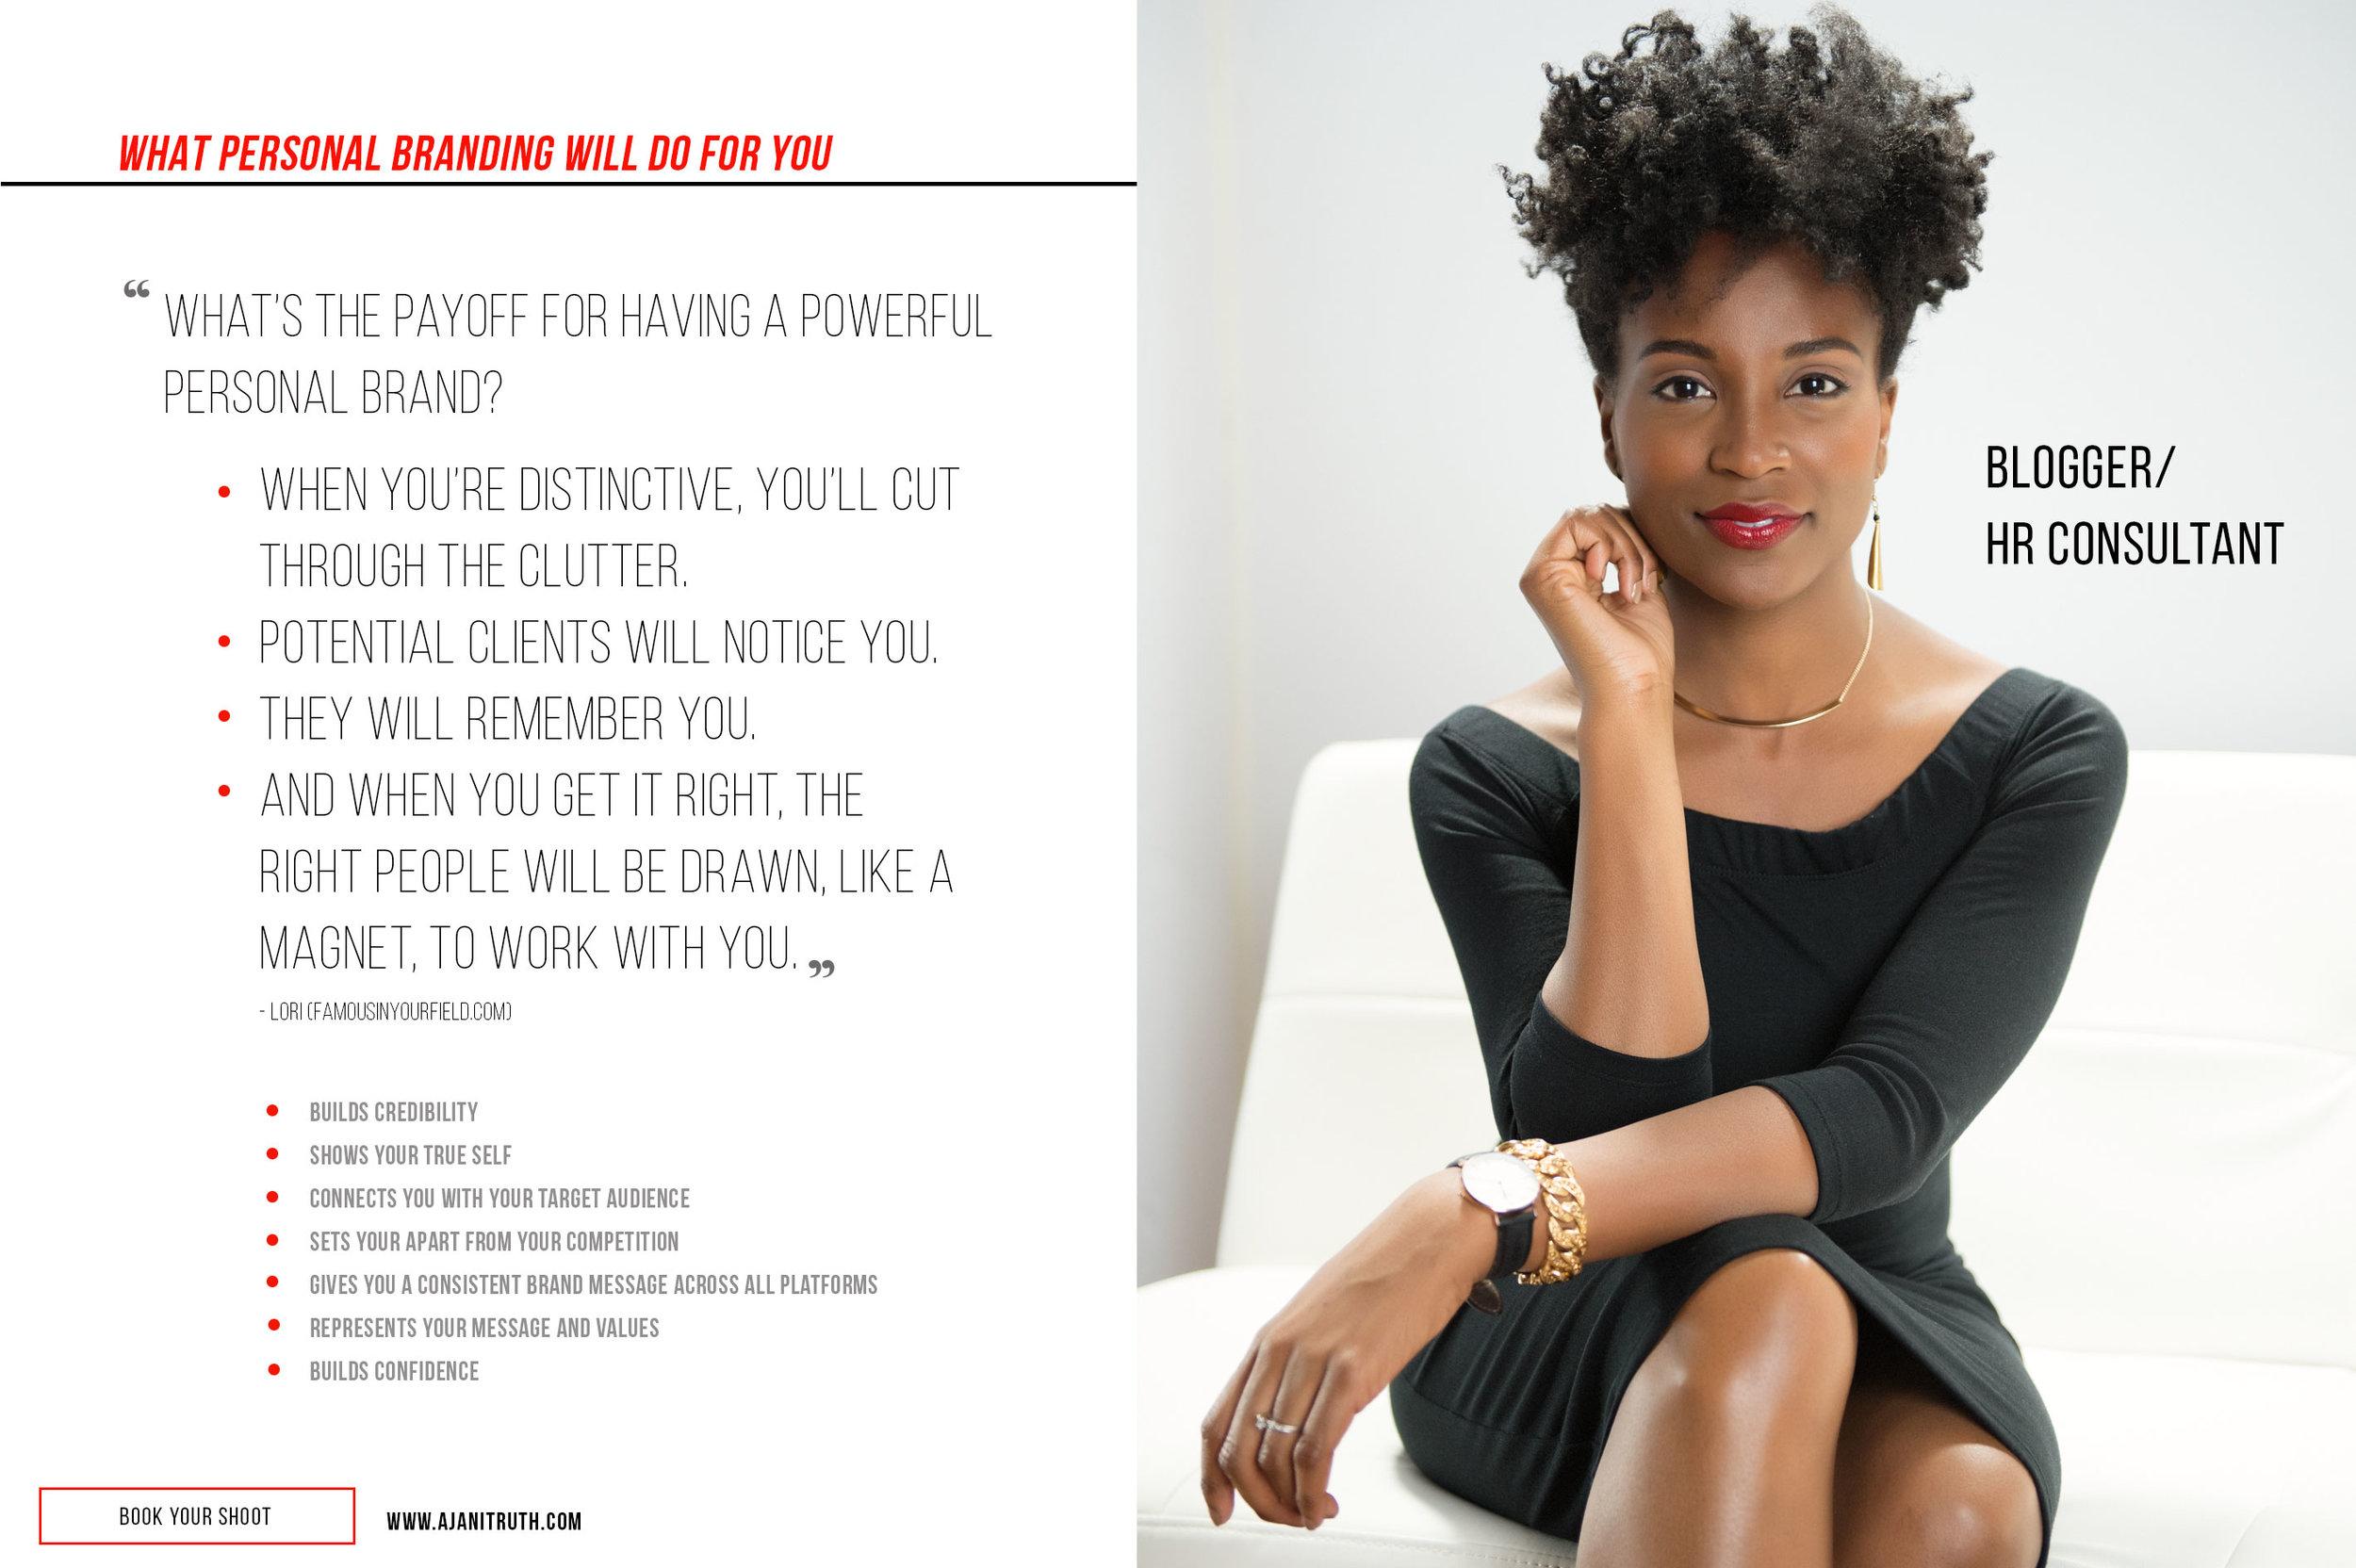 3_personalbranding_what_will_do_for_you.jpg